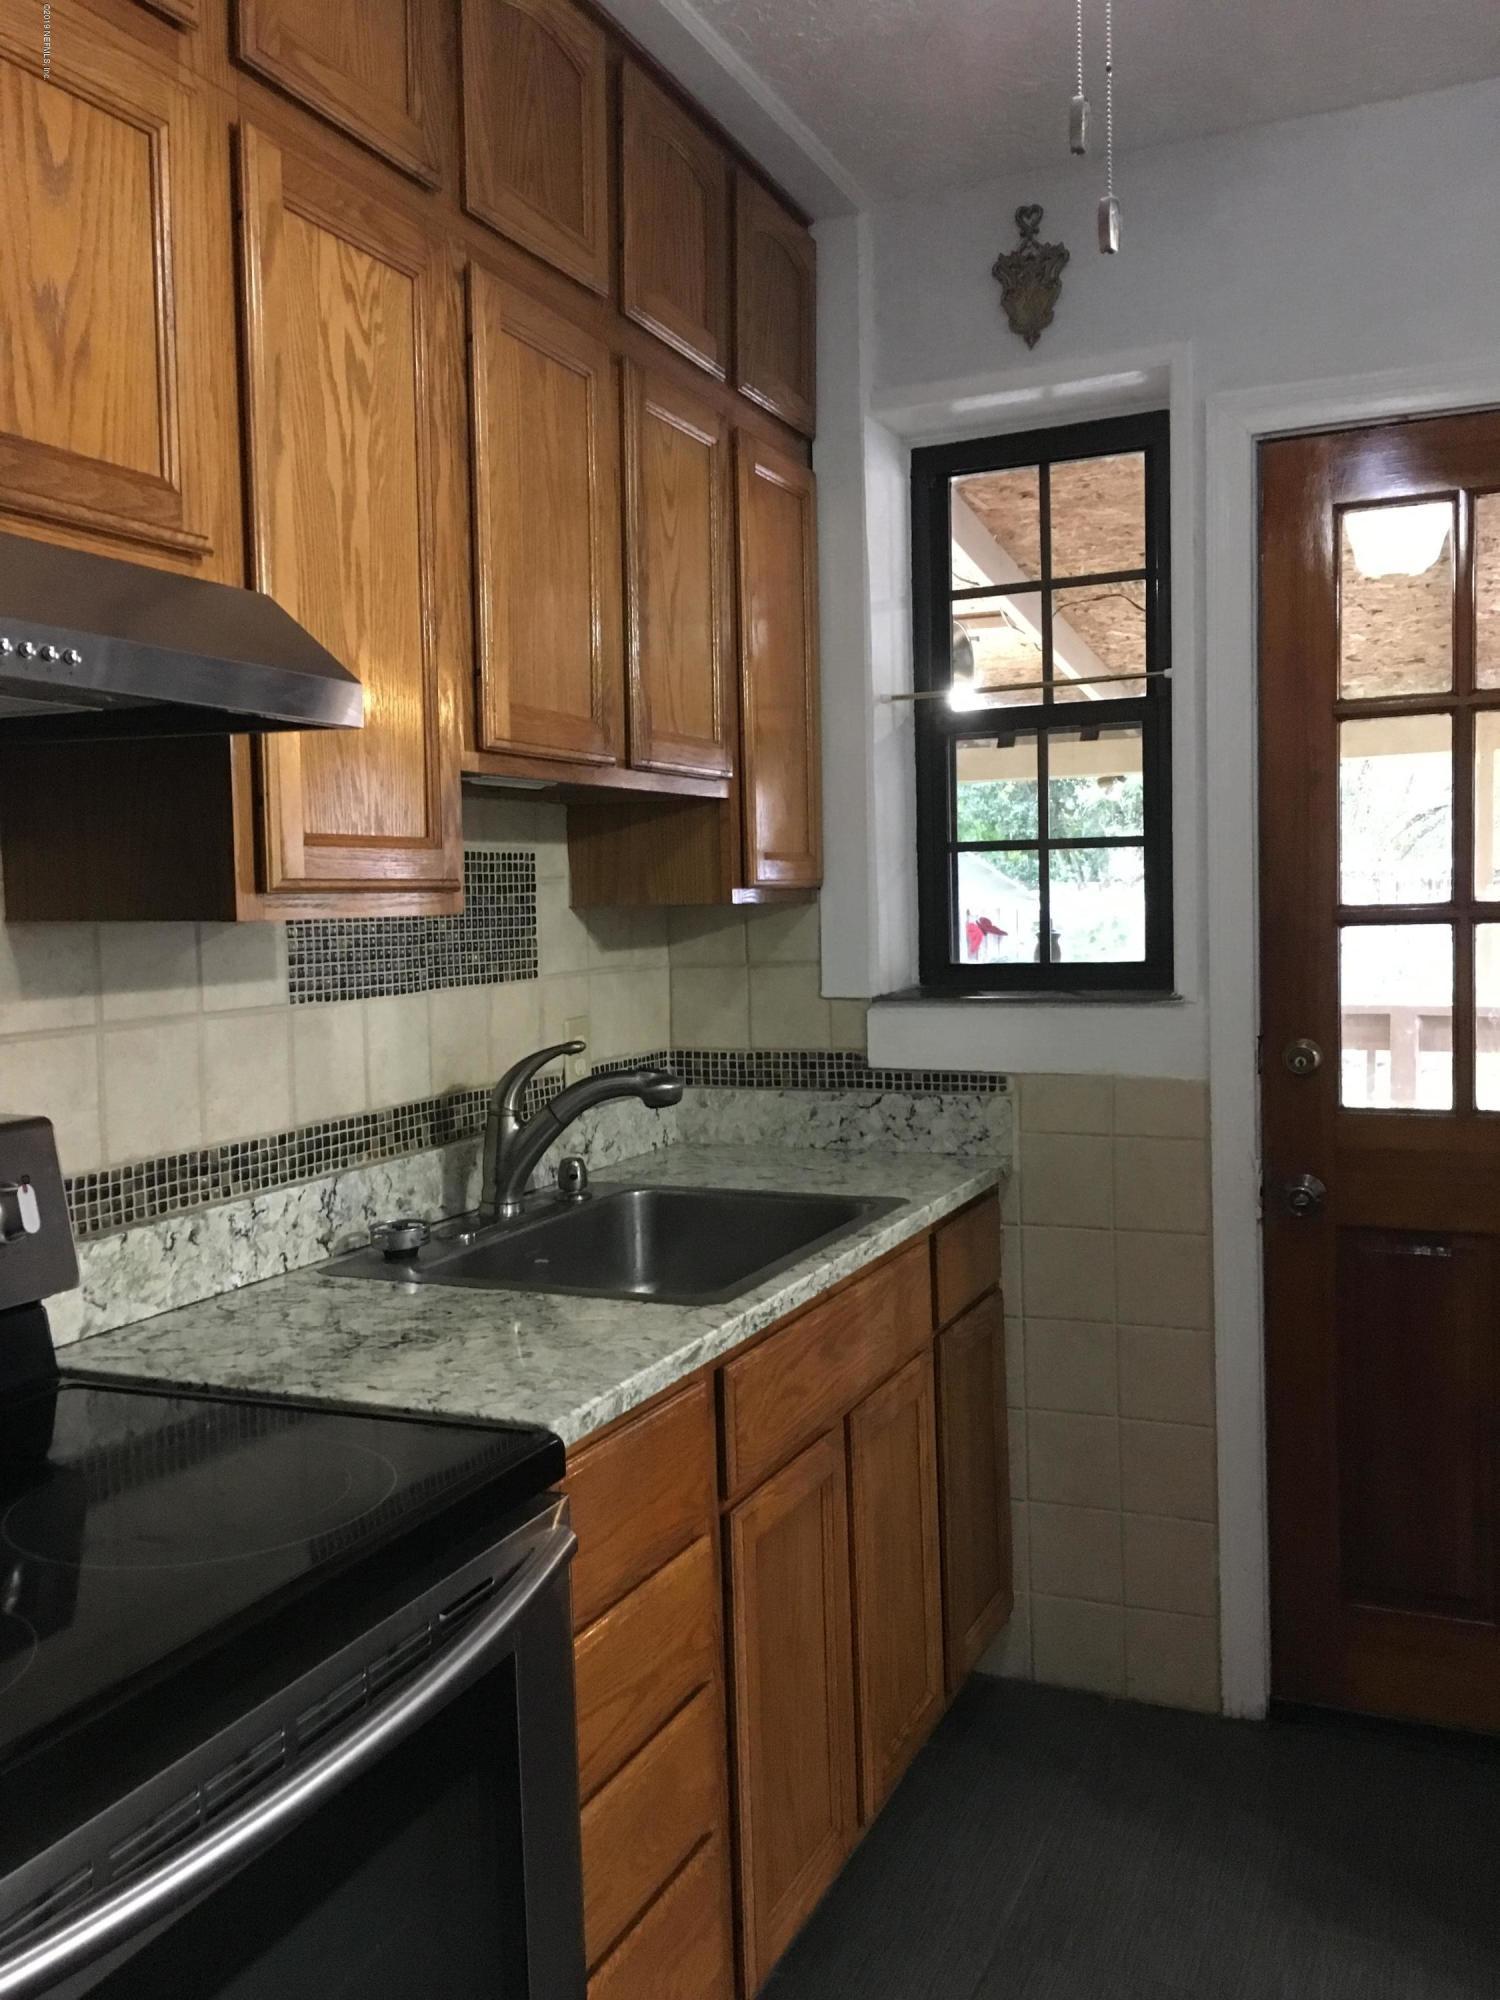 4651 BLOUNT, JACKSONVILLE, FLORIDA 32210, 2 Bedrooms Bedrooms, ,1 BathroomBathrooms,Residential - single family,For sale,BLOUNT,1005197